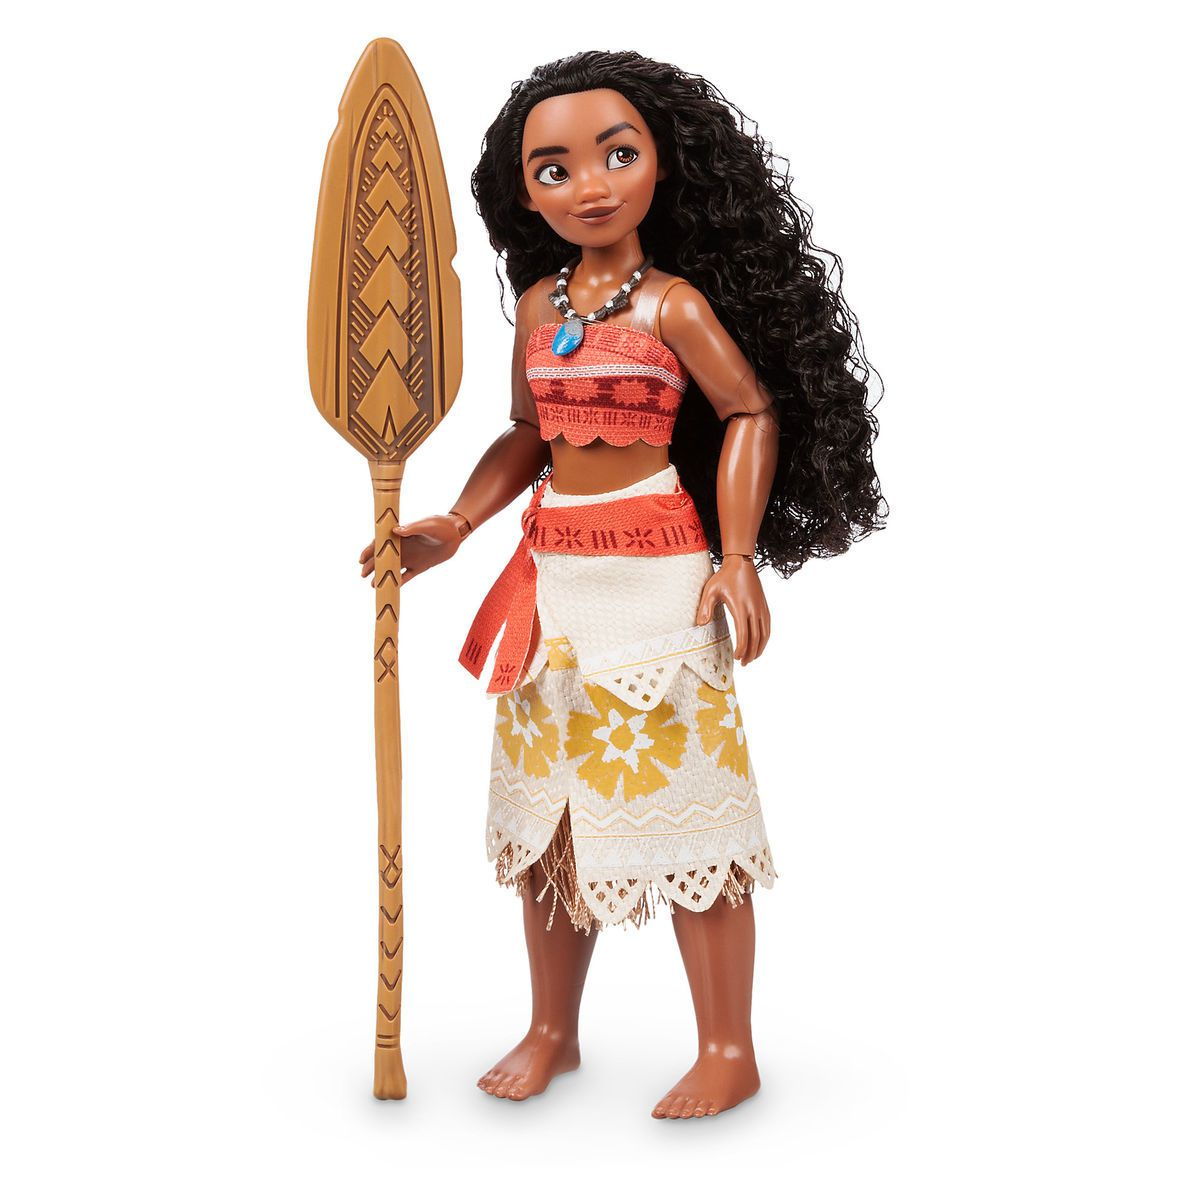 Boneca Moana - Classic Doll - Original Disney Store